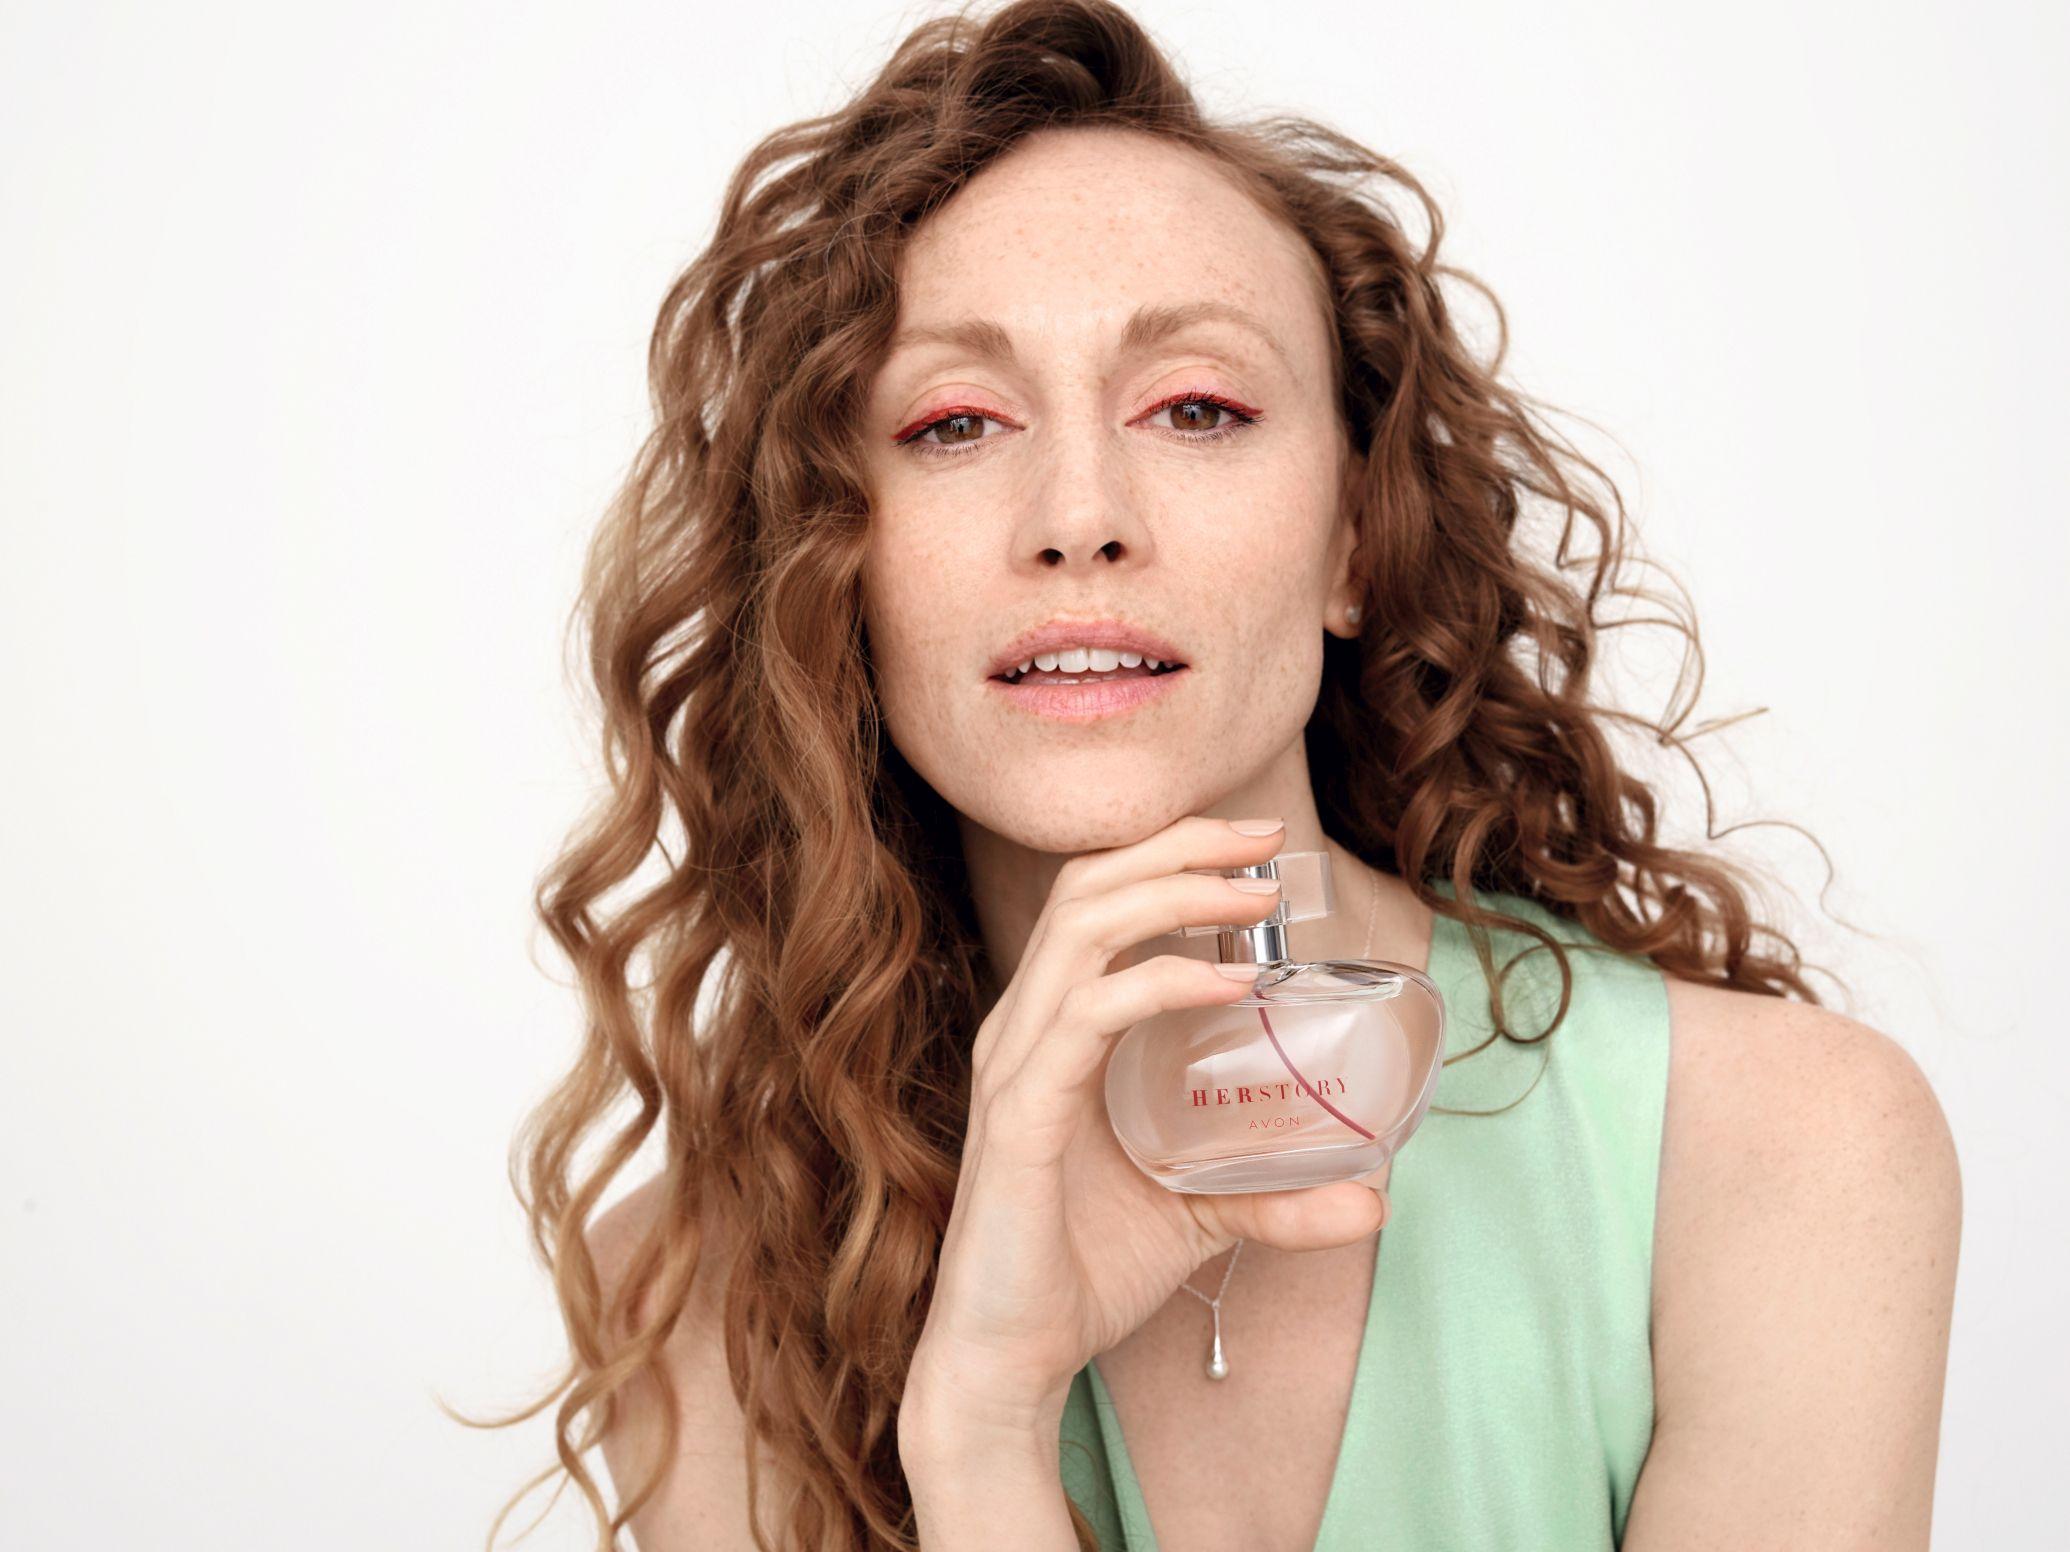 Avon predstavlja Her Story, novi miris koji slavi stvarne inspirativne priče žena